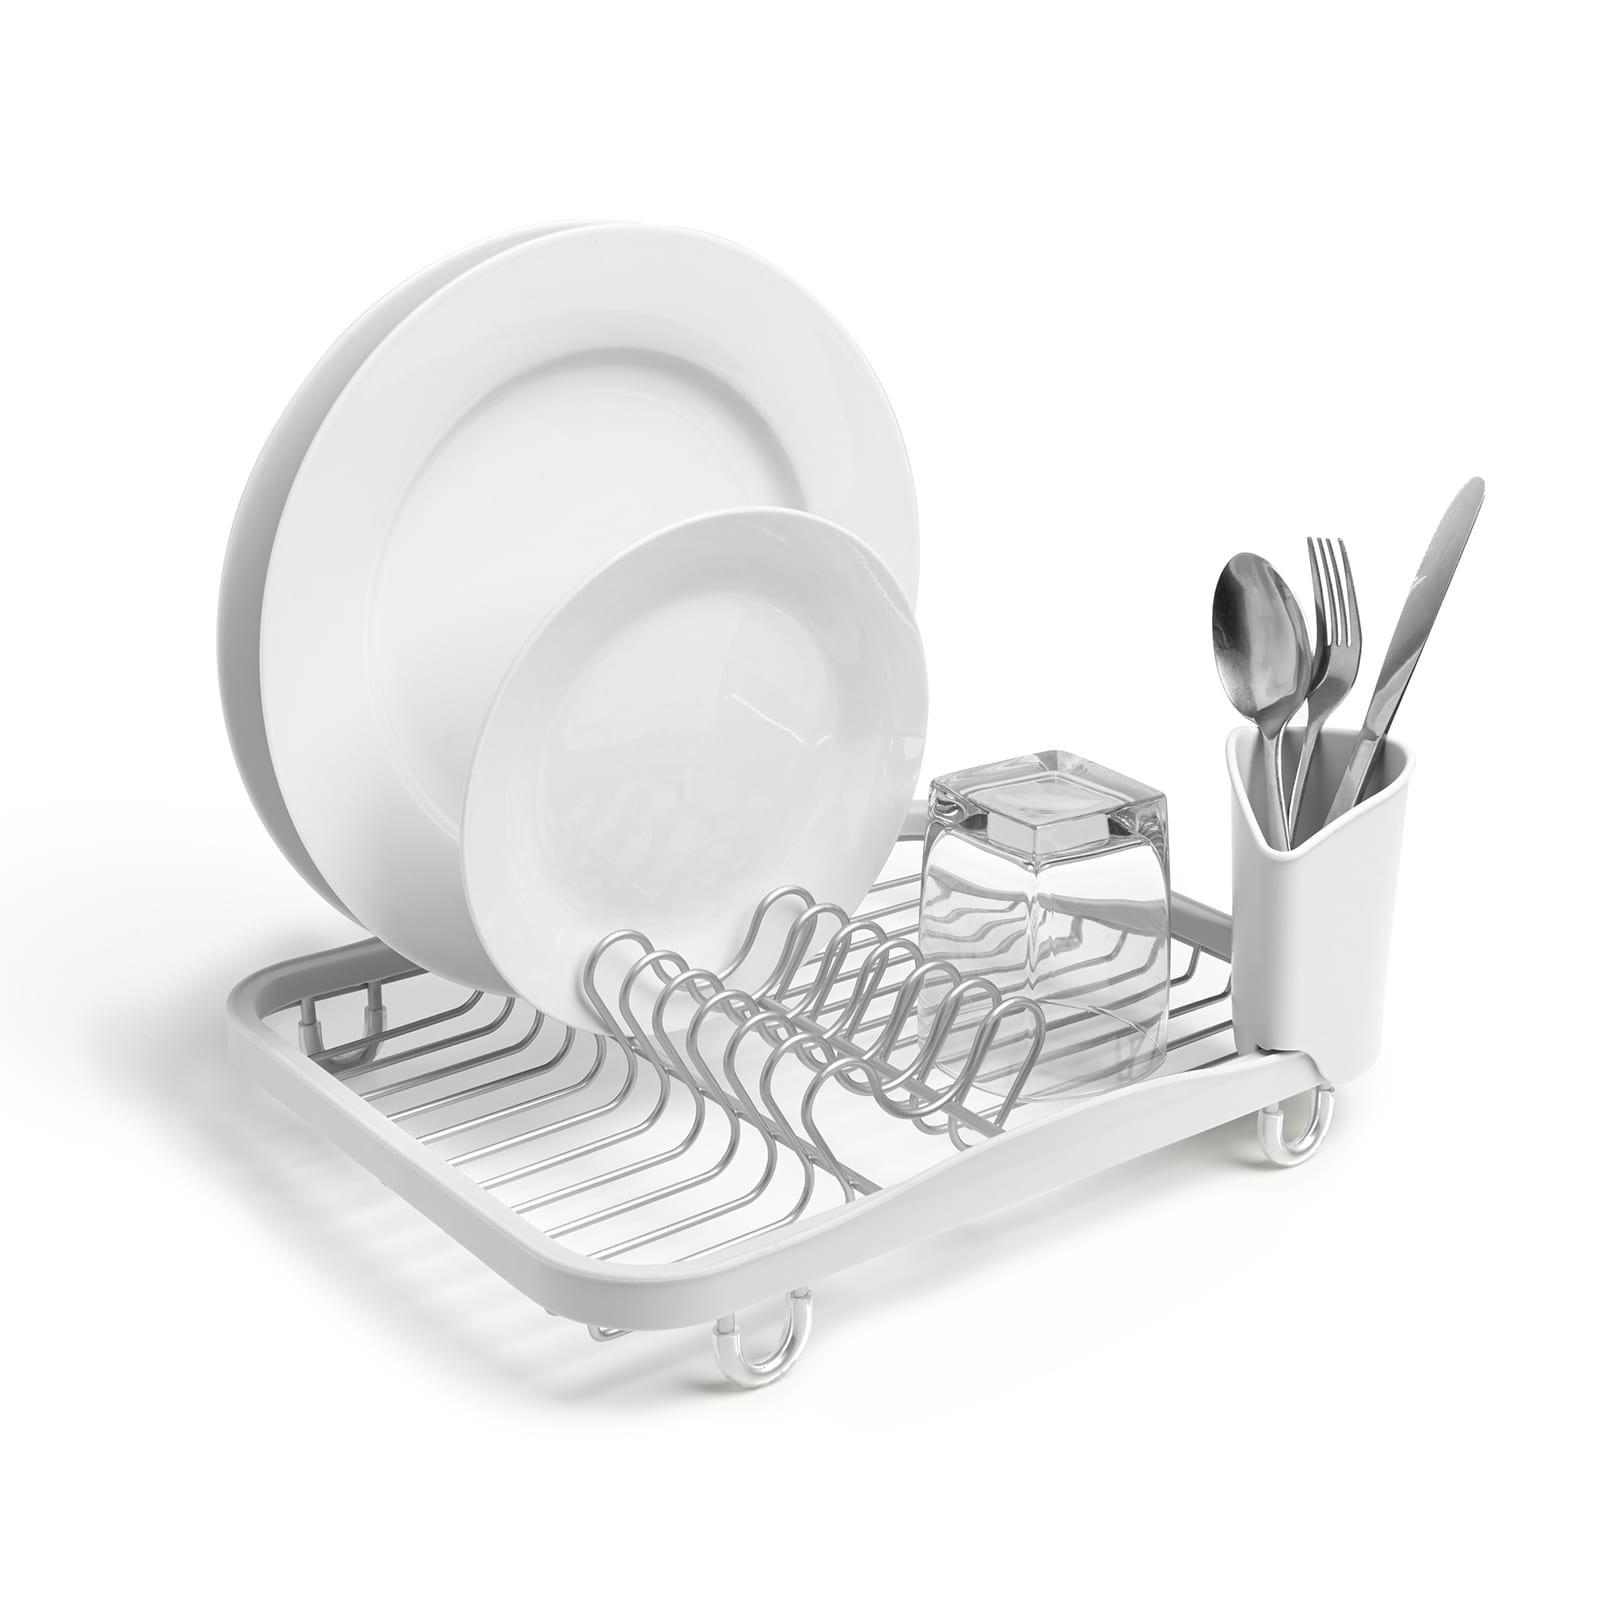 Sinkin Dish Rack (White) - Umbra